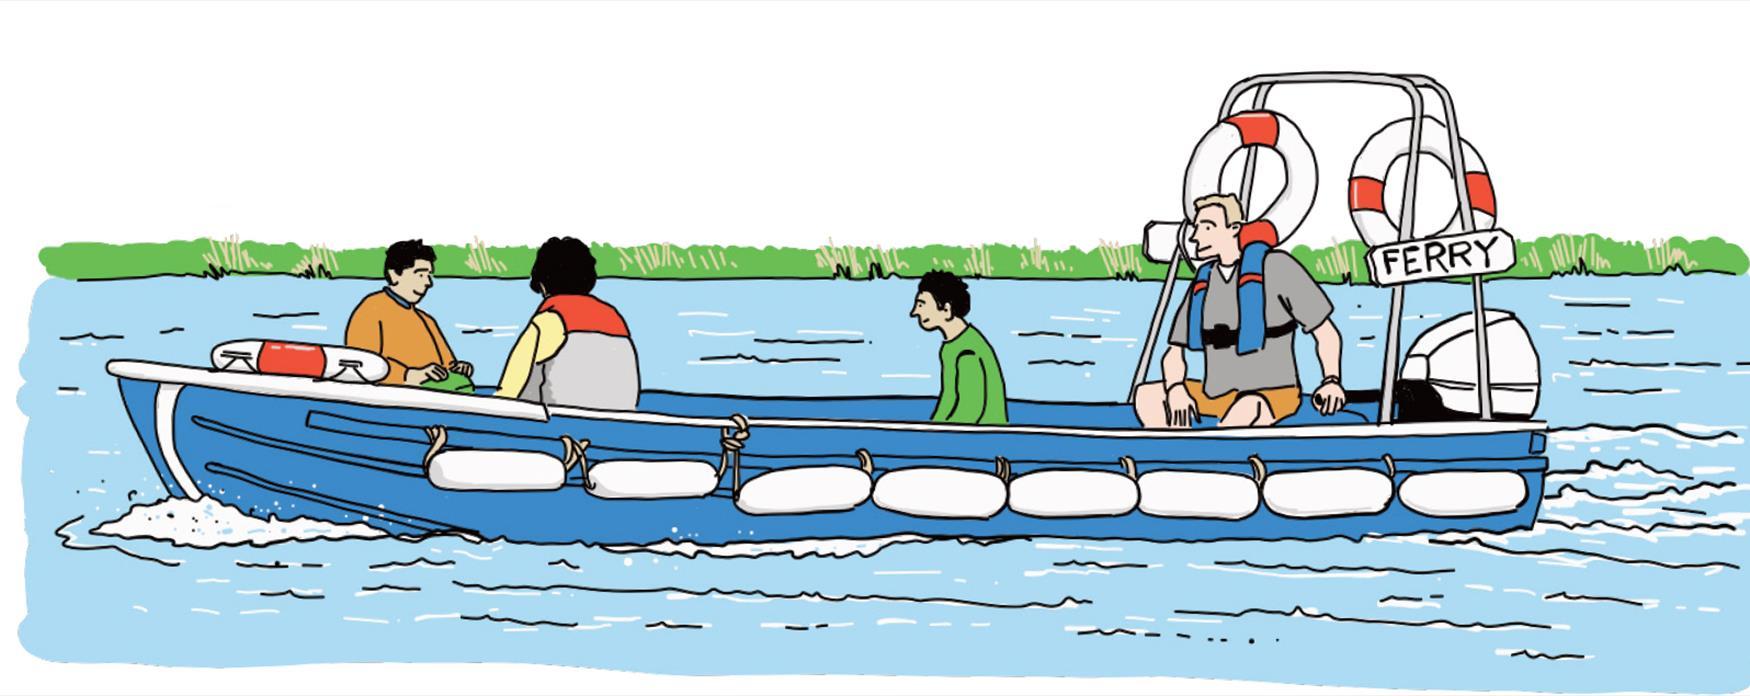 Ferry ride- DRAB